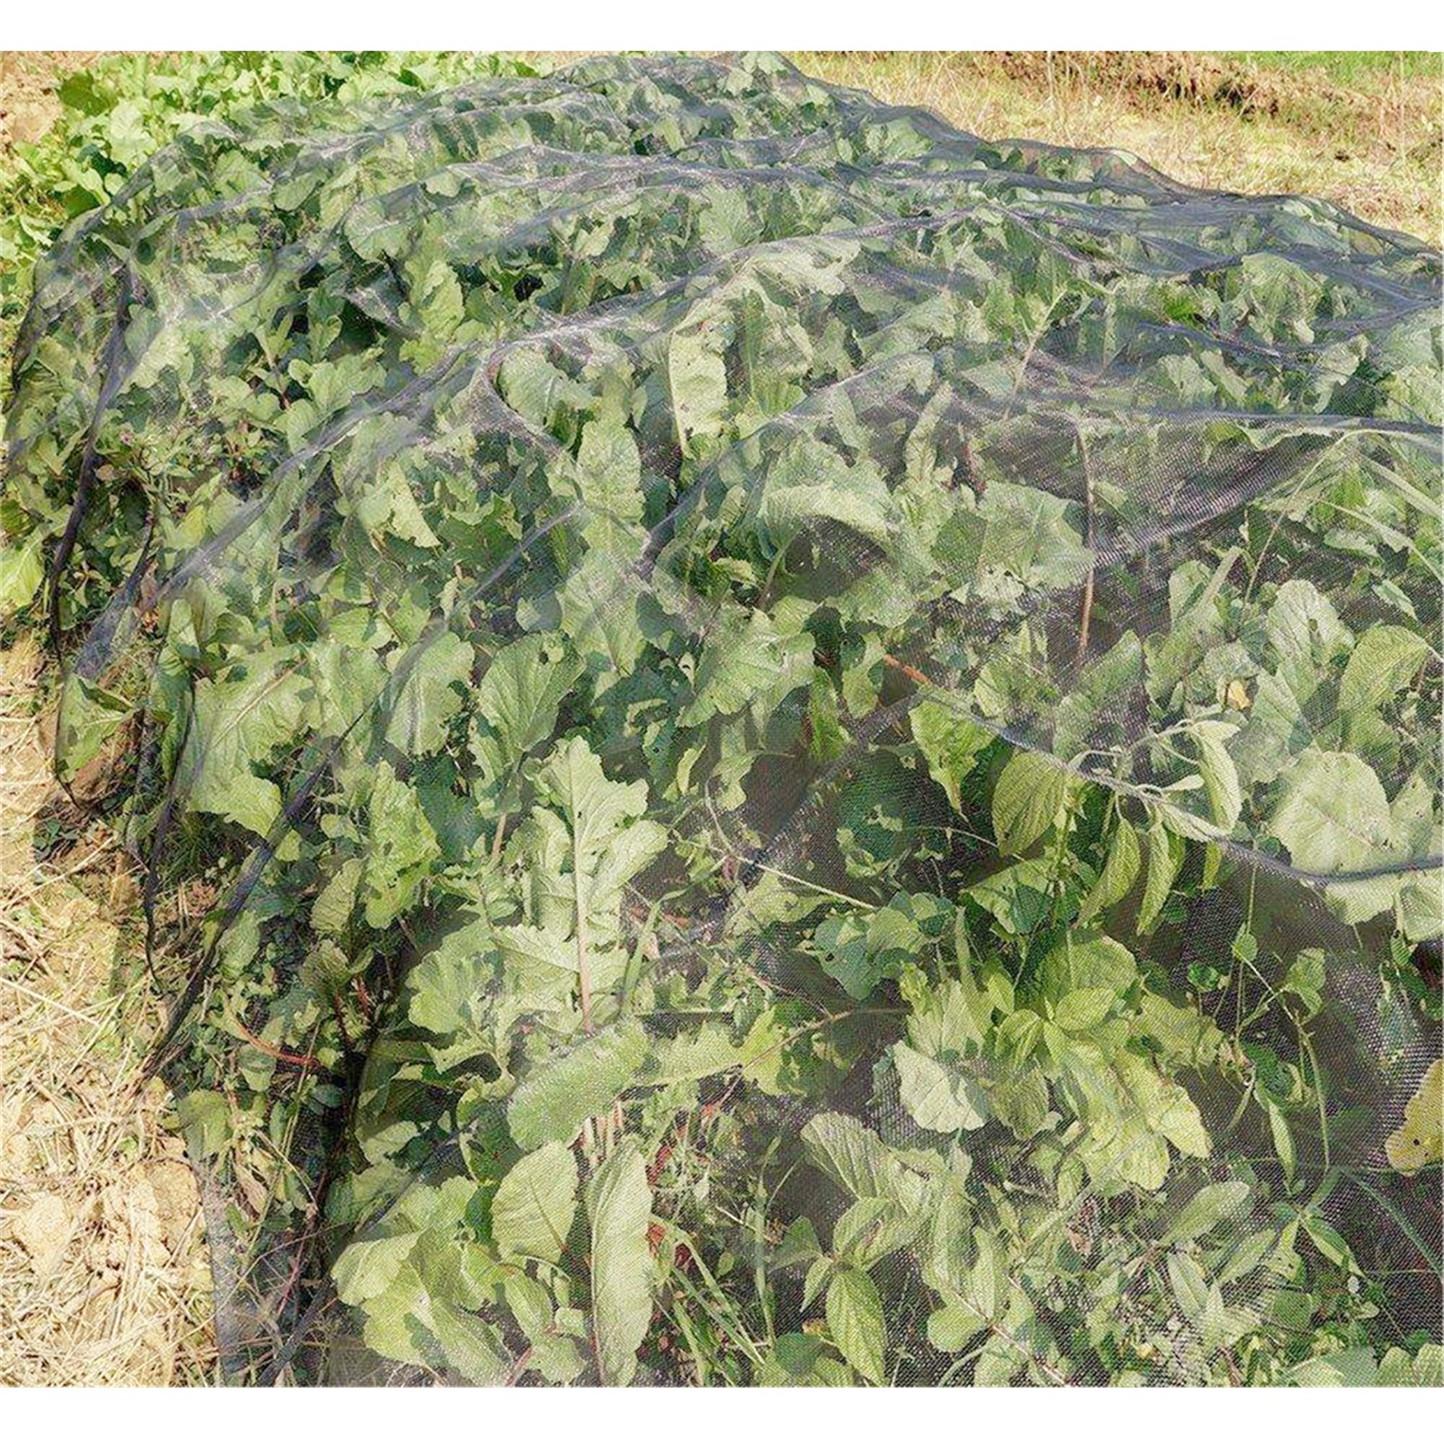 Rede de jardim agrícola anti-insetos